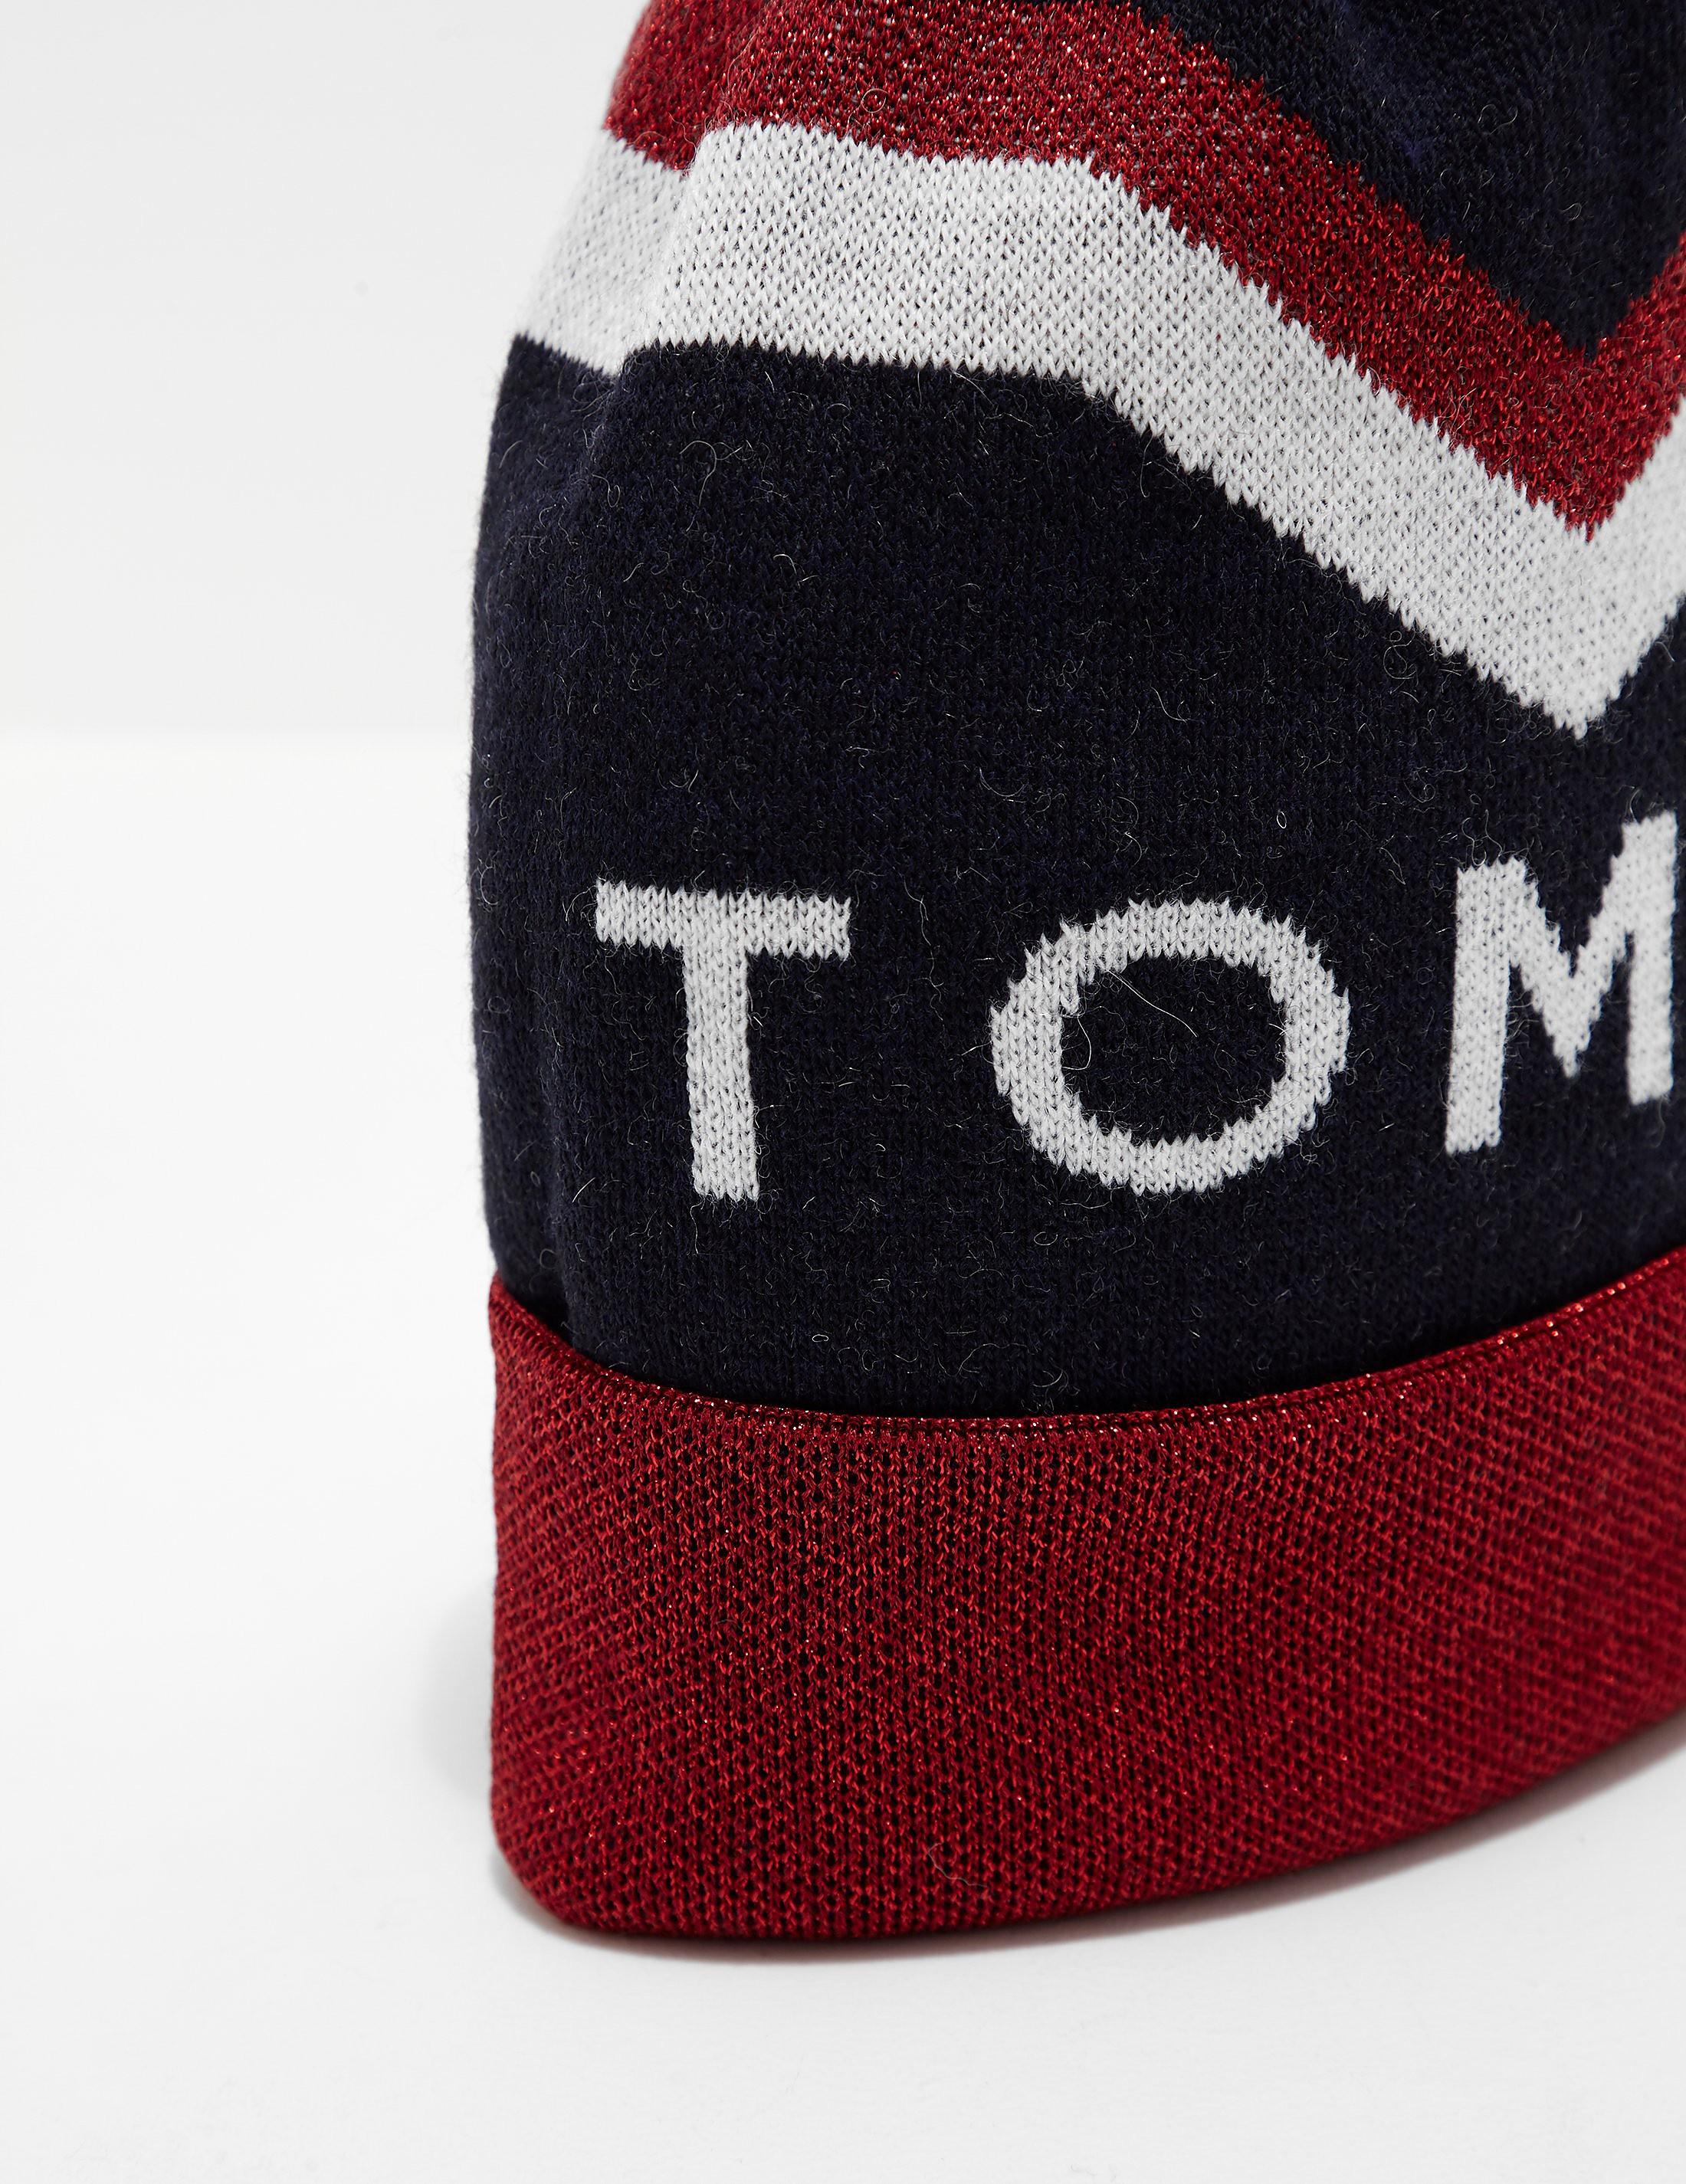 Tommy Hilfiger Chevron Pom Pom Beanie